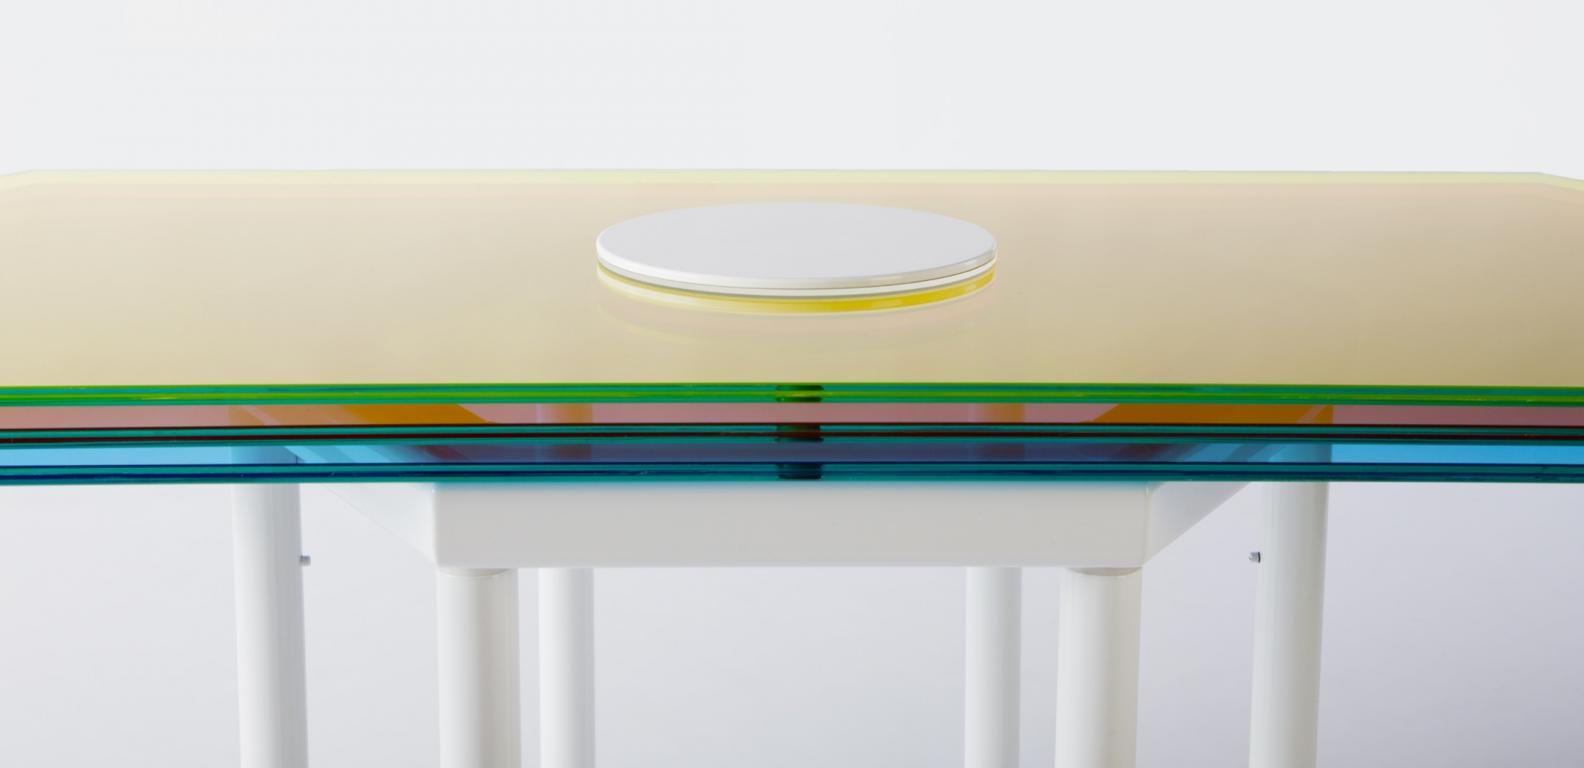 Spectrum-finalnd-lumon-oy-vanceva